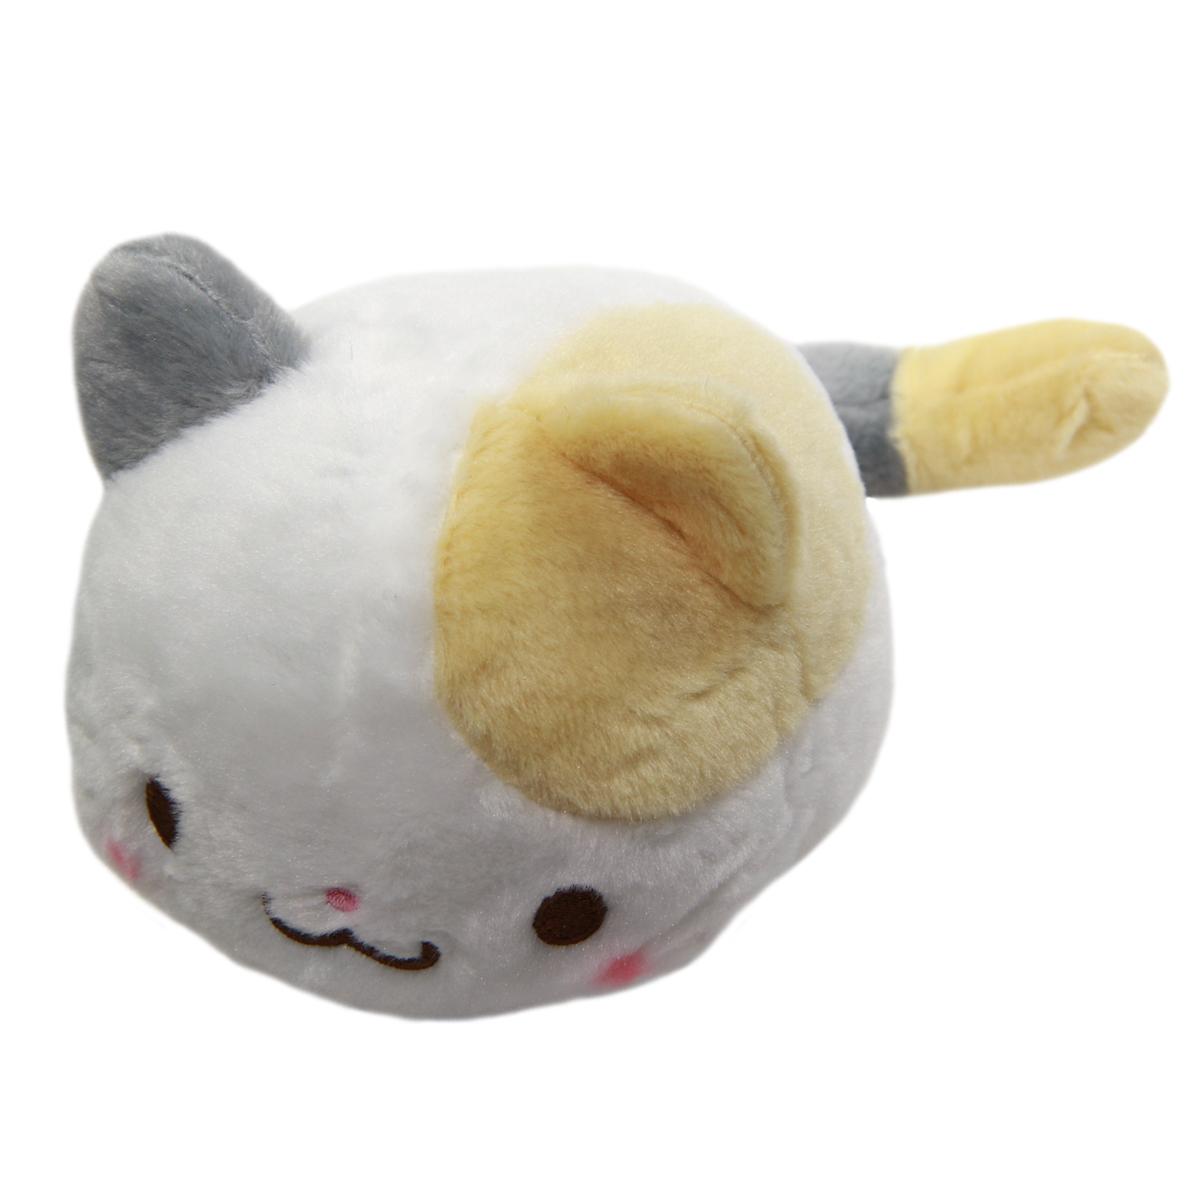 Kawaii Neko Plushie White/Beige/Grey Cat Plush Doll Super Soft Stuffed Animal Standard Size 6